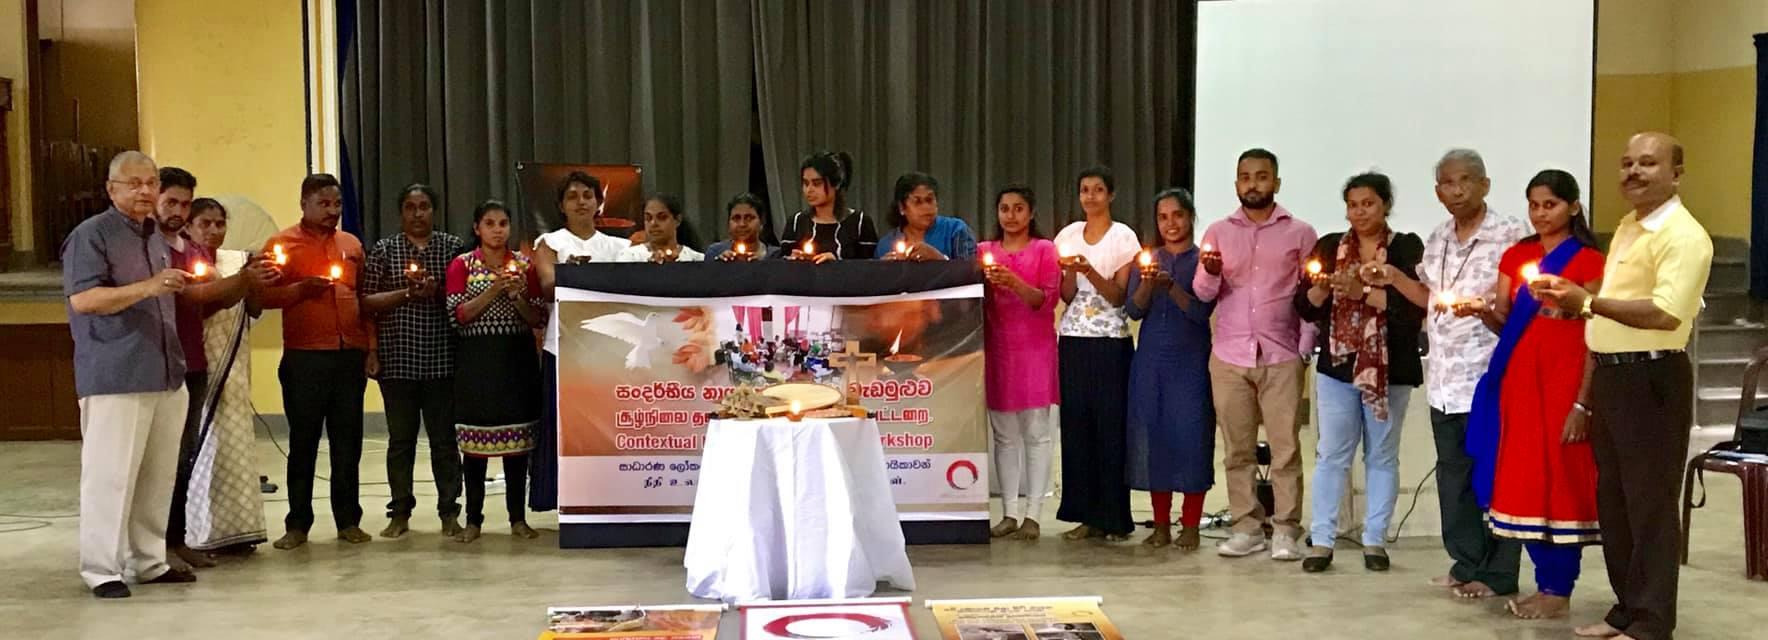 The latest graduates of OMNIA's IPT Advanced Training in Sri Lanka.